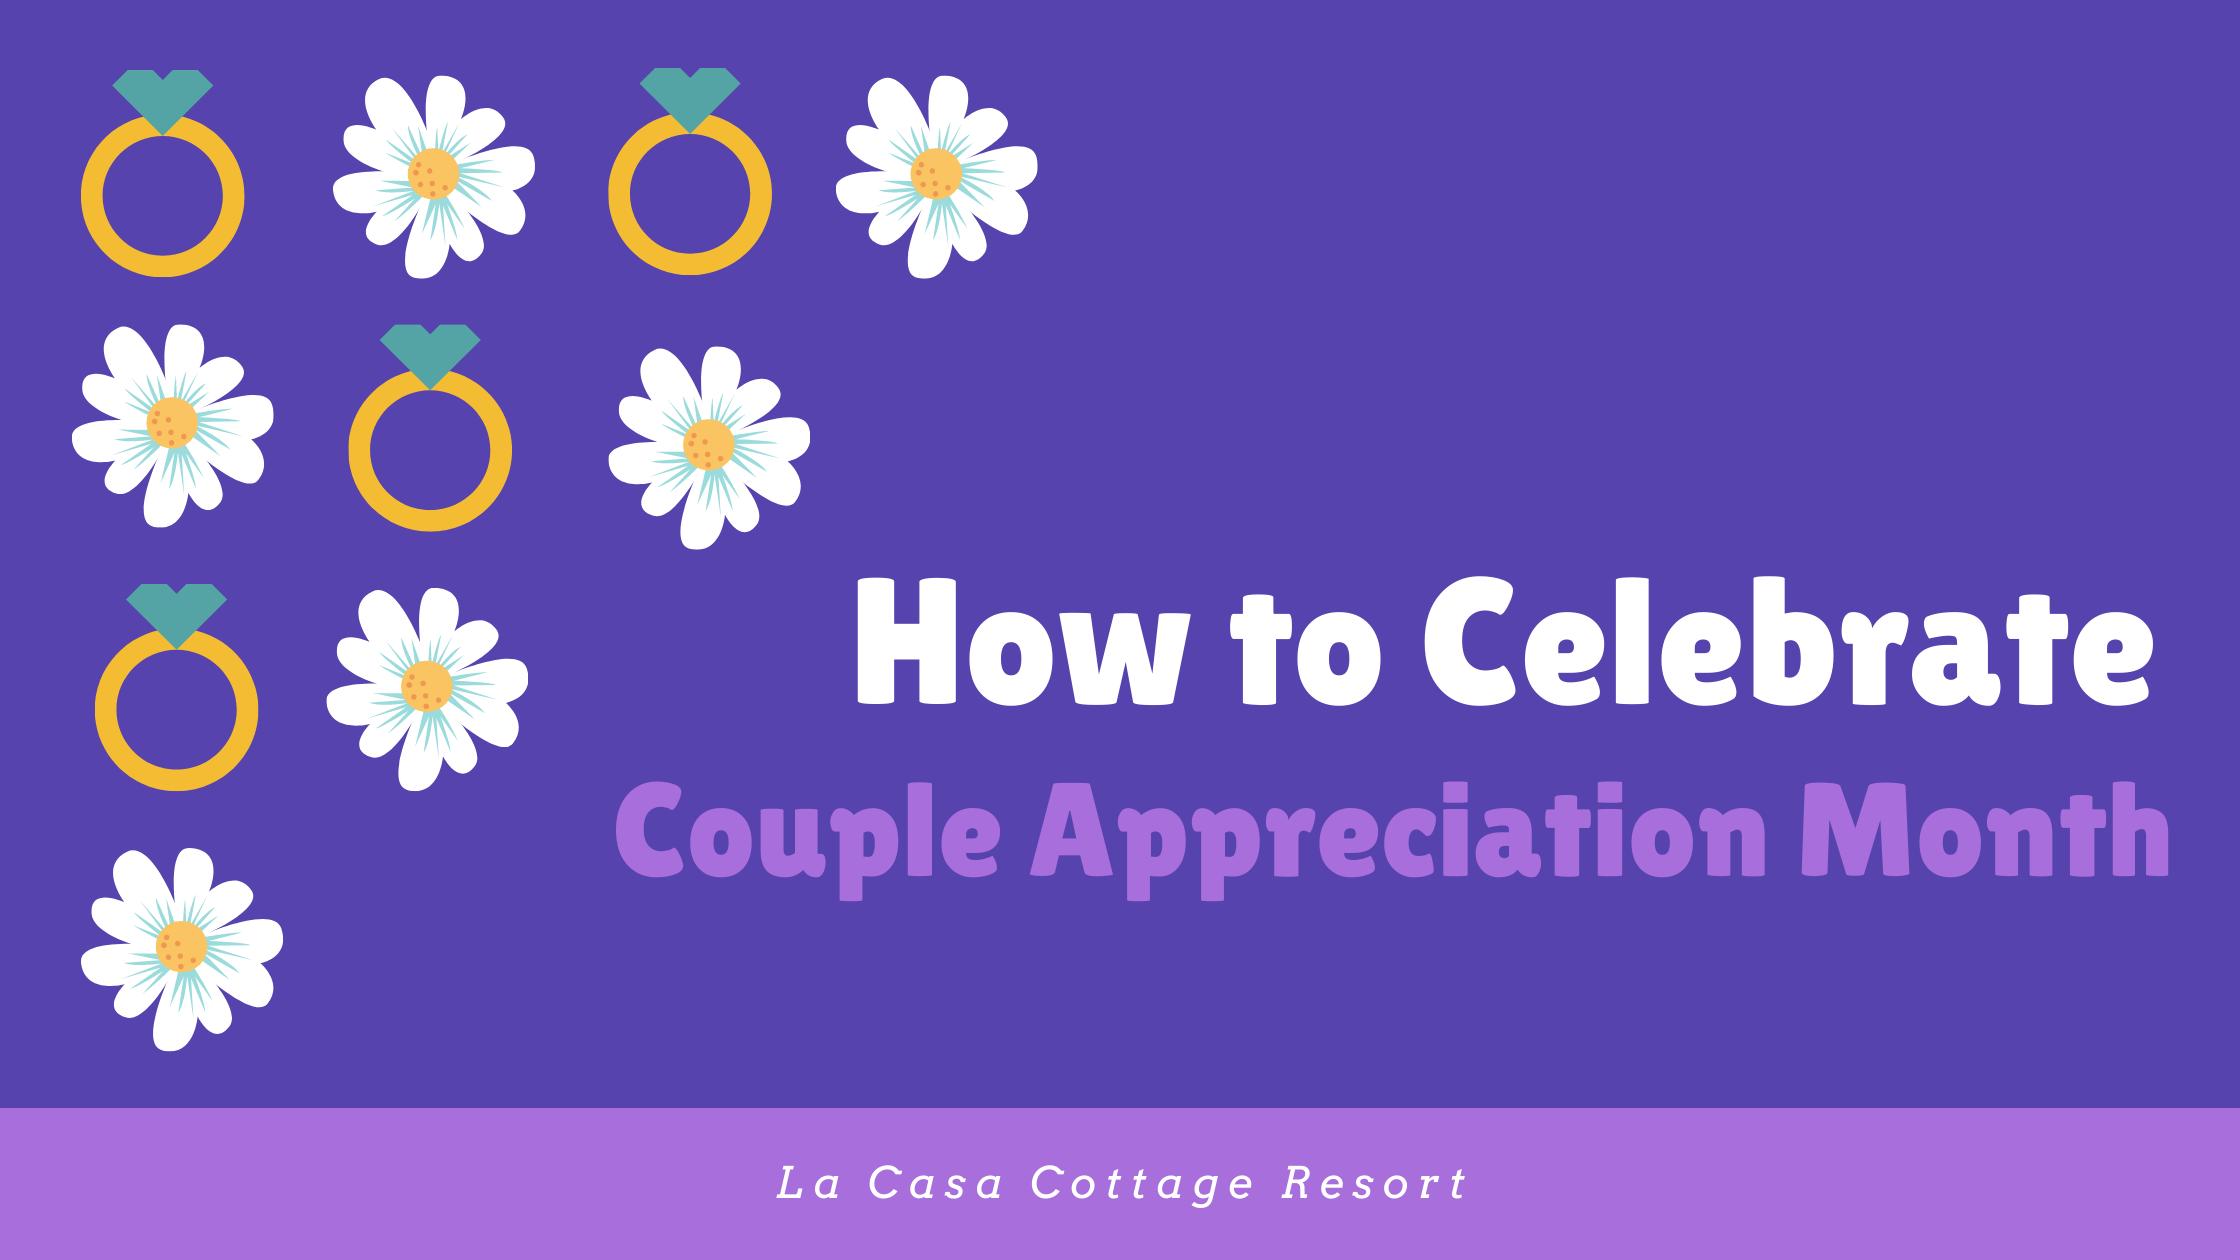 Couples Appreciation month